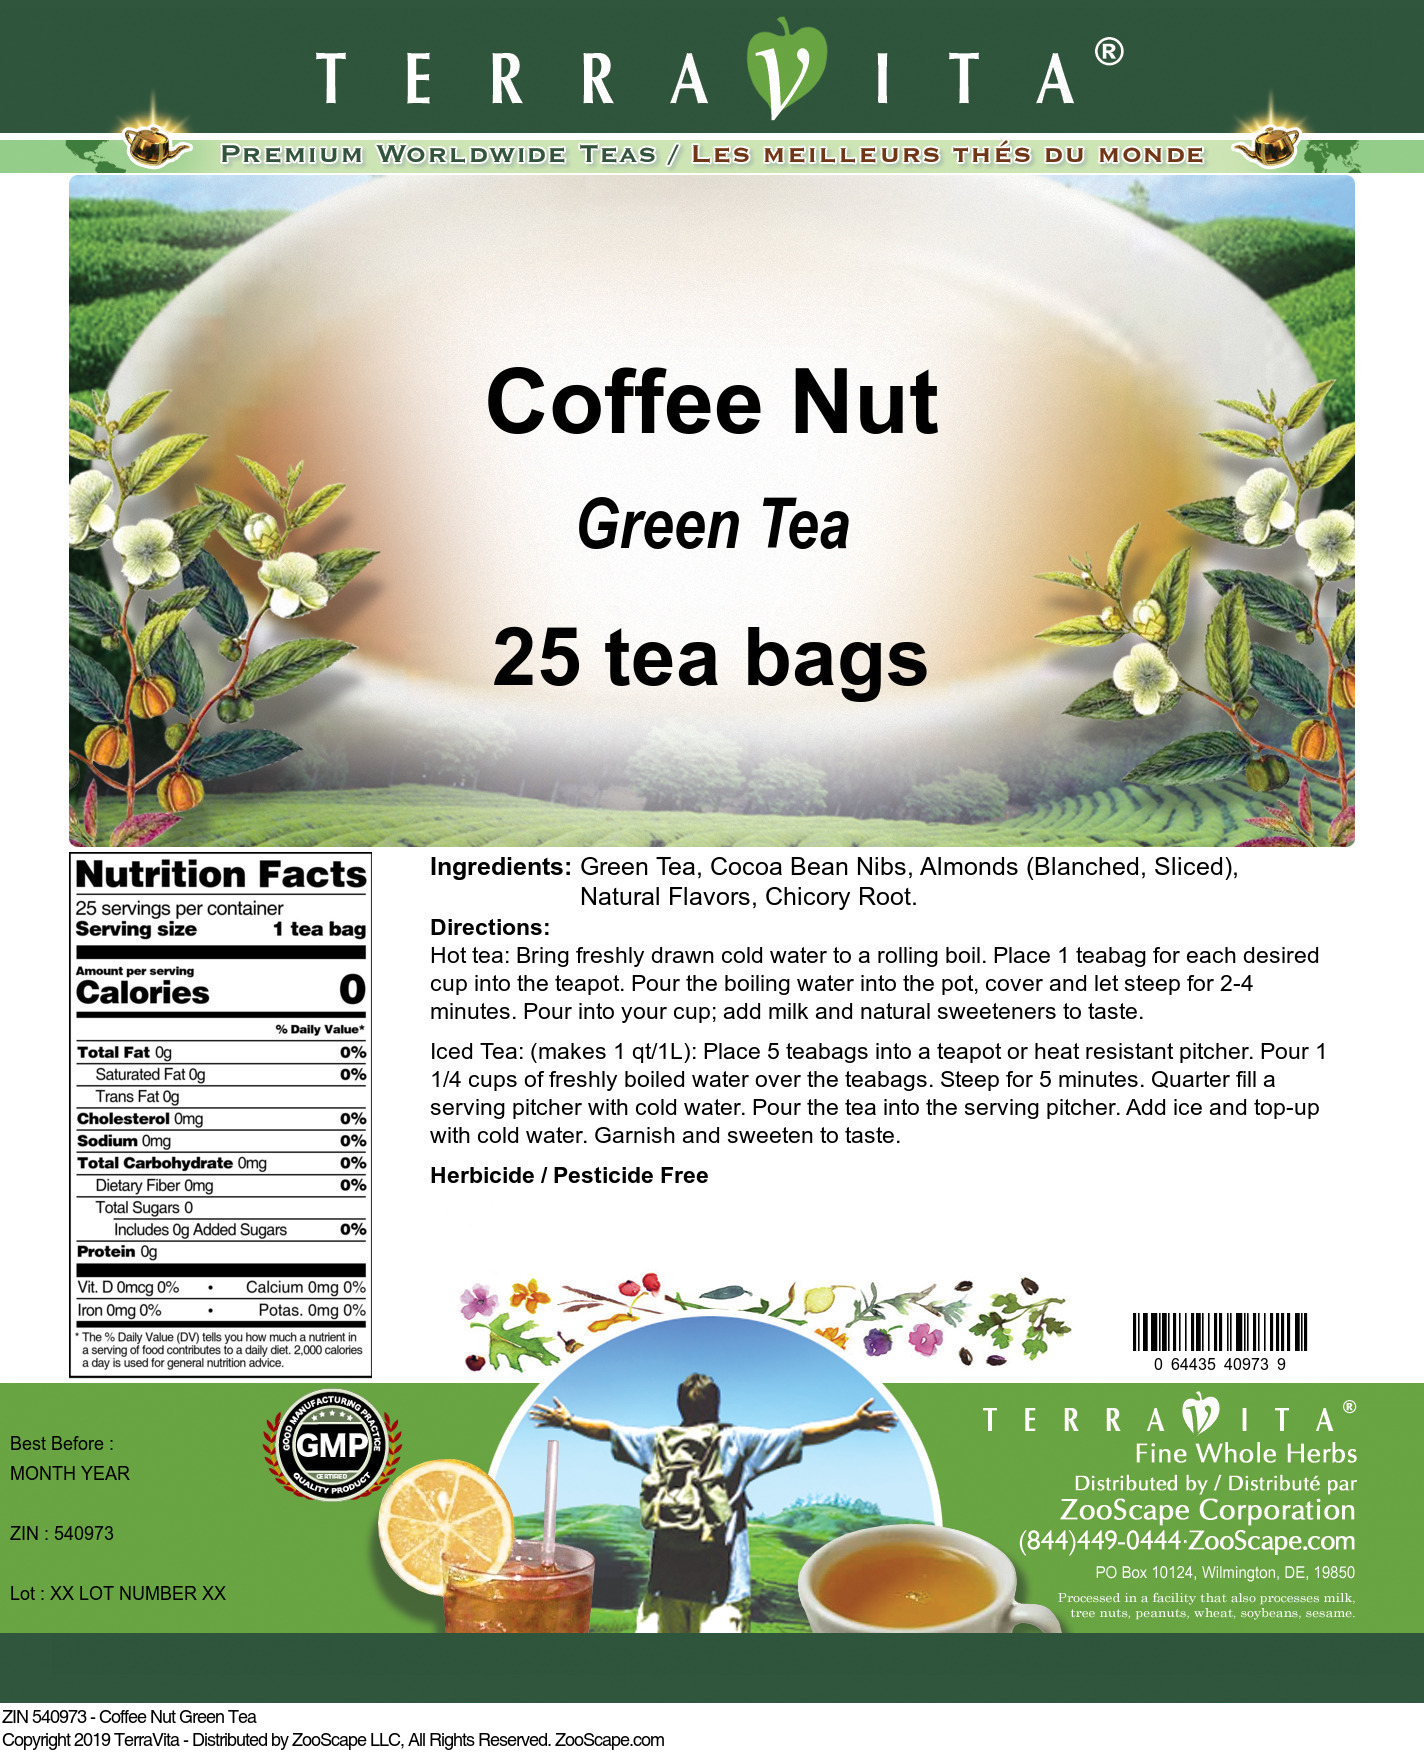 Coffee Nut Green Tea